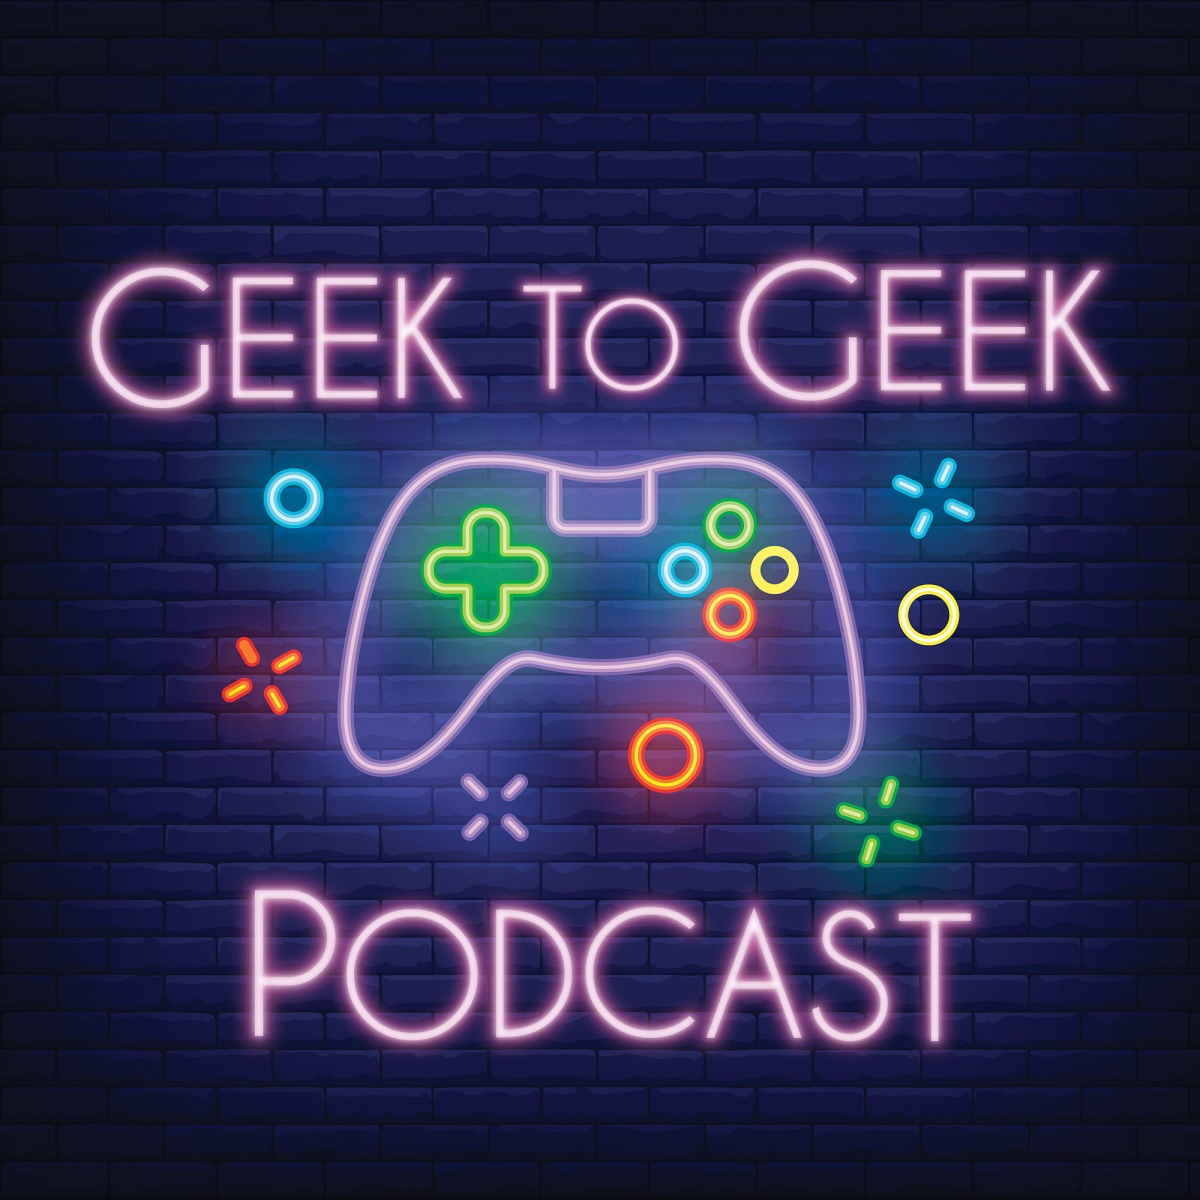 Geek to Geek Podcast logo